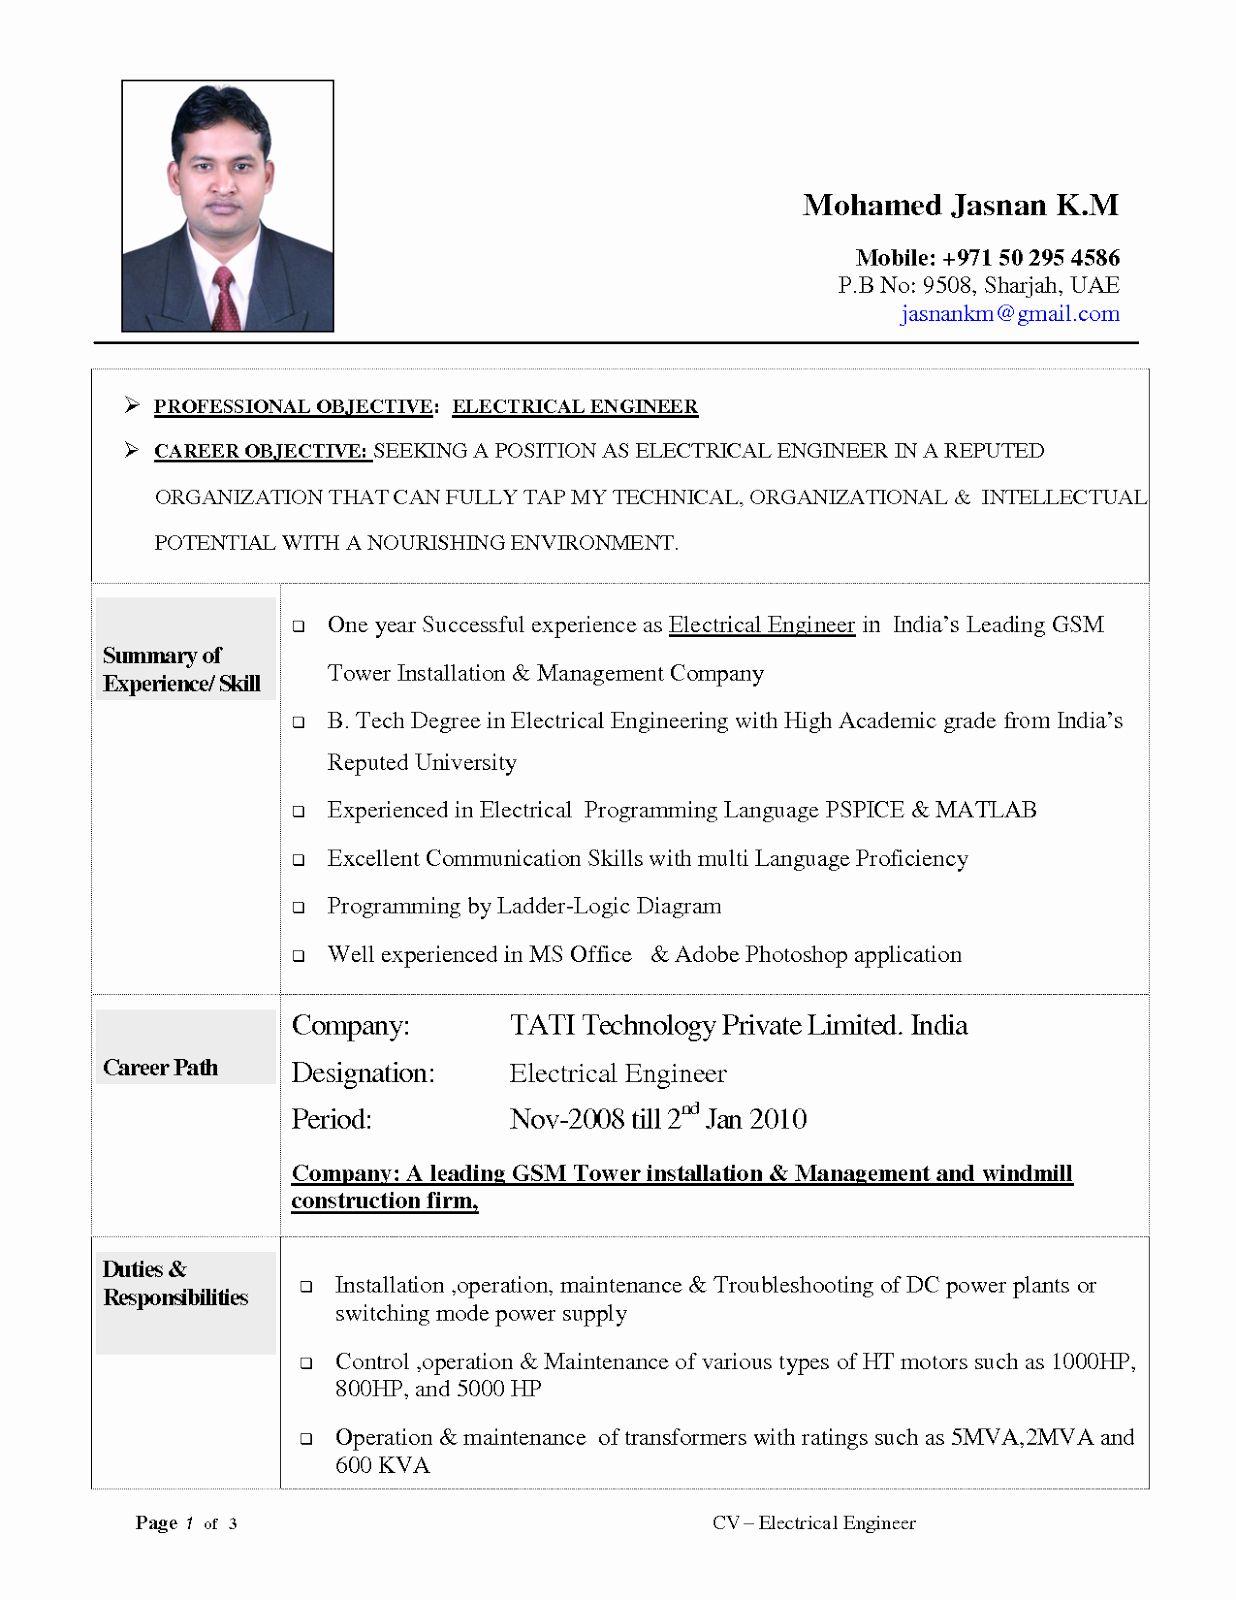 Electrical Engineer Resume Sample Elegant Resume Objective